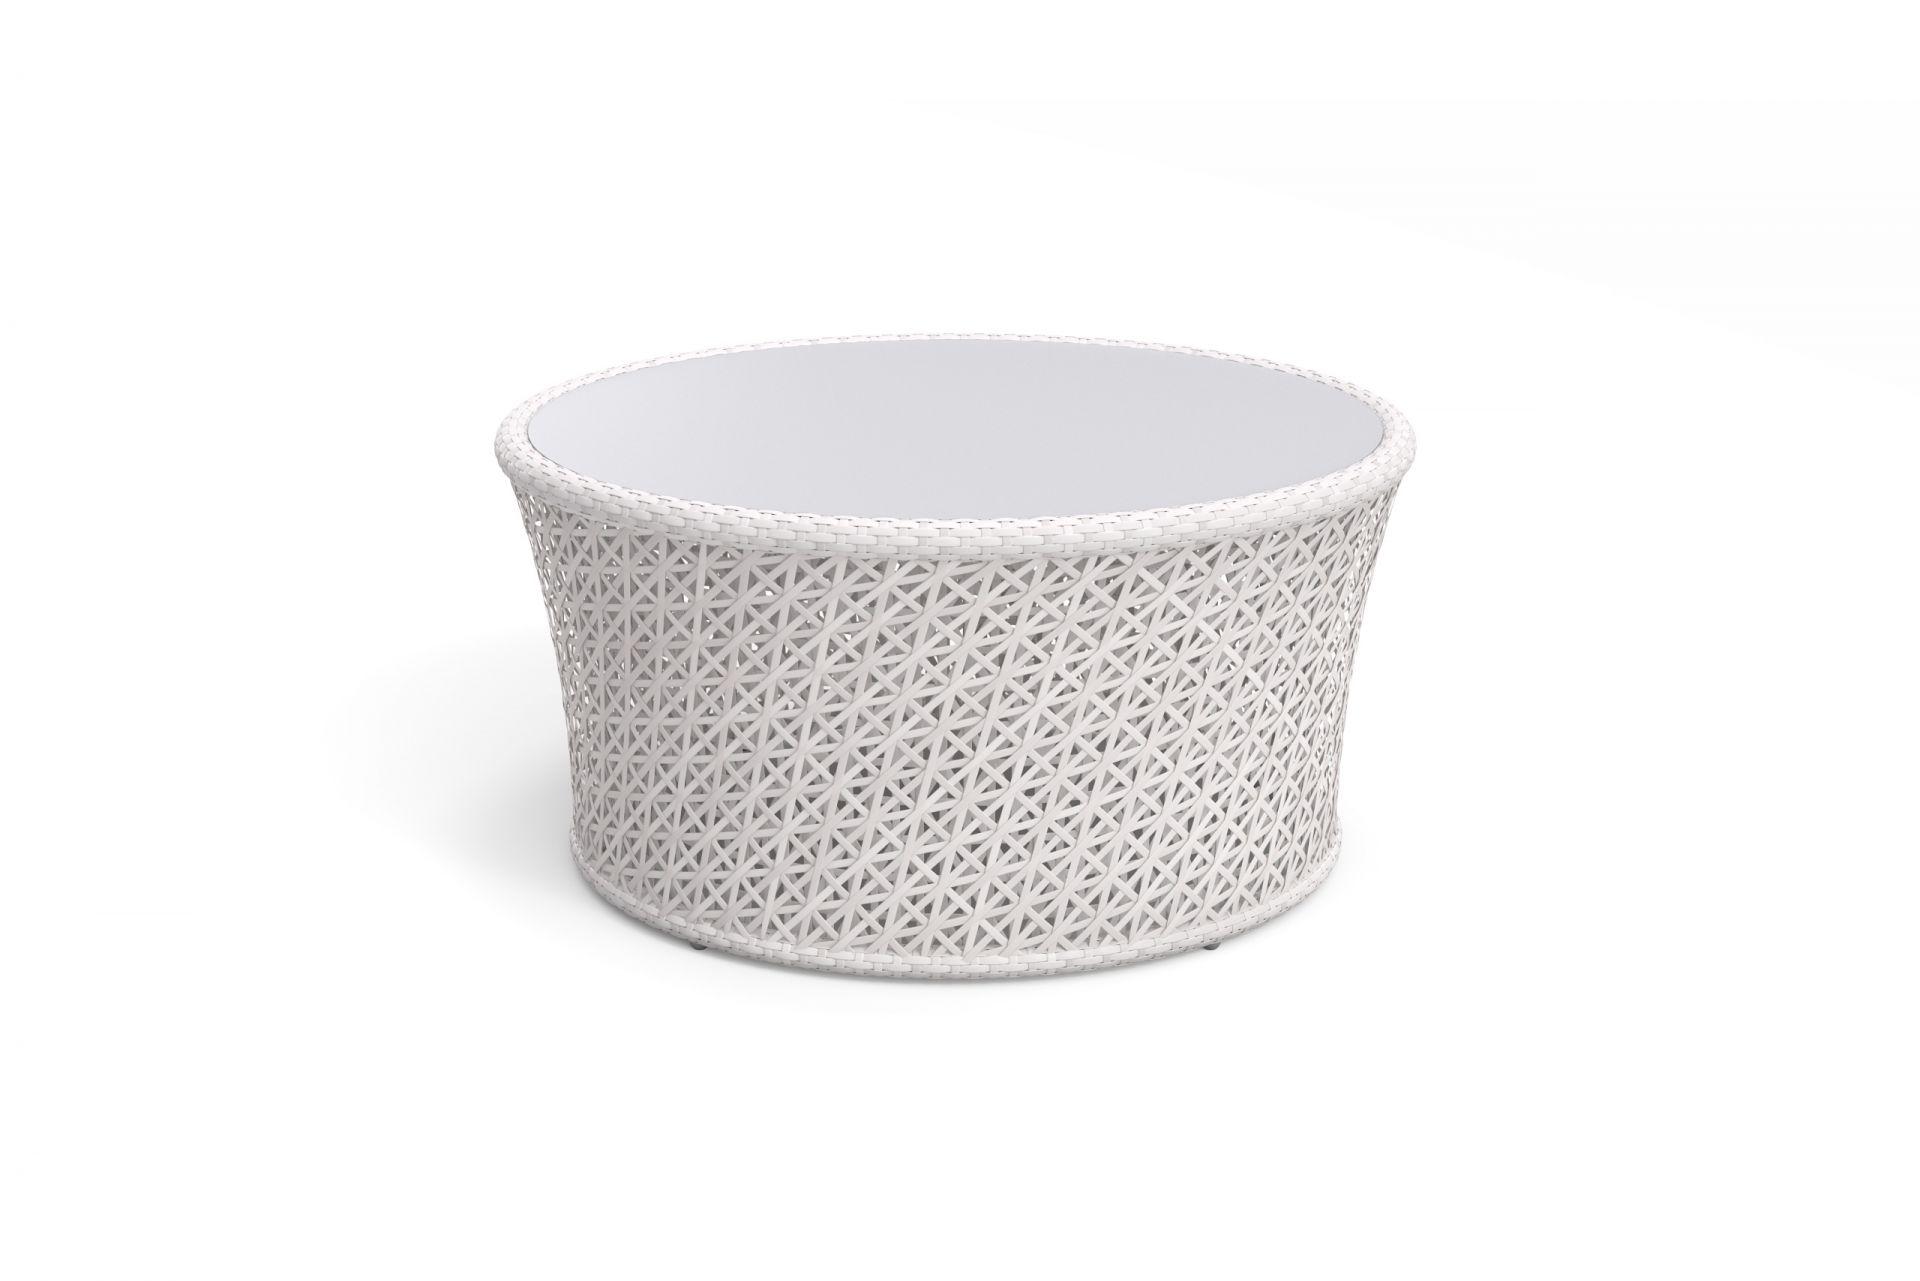 PORTO Kaffee-Tisch